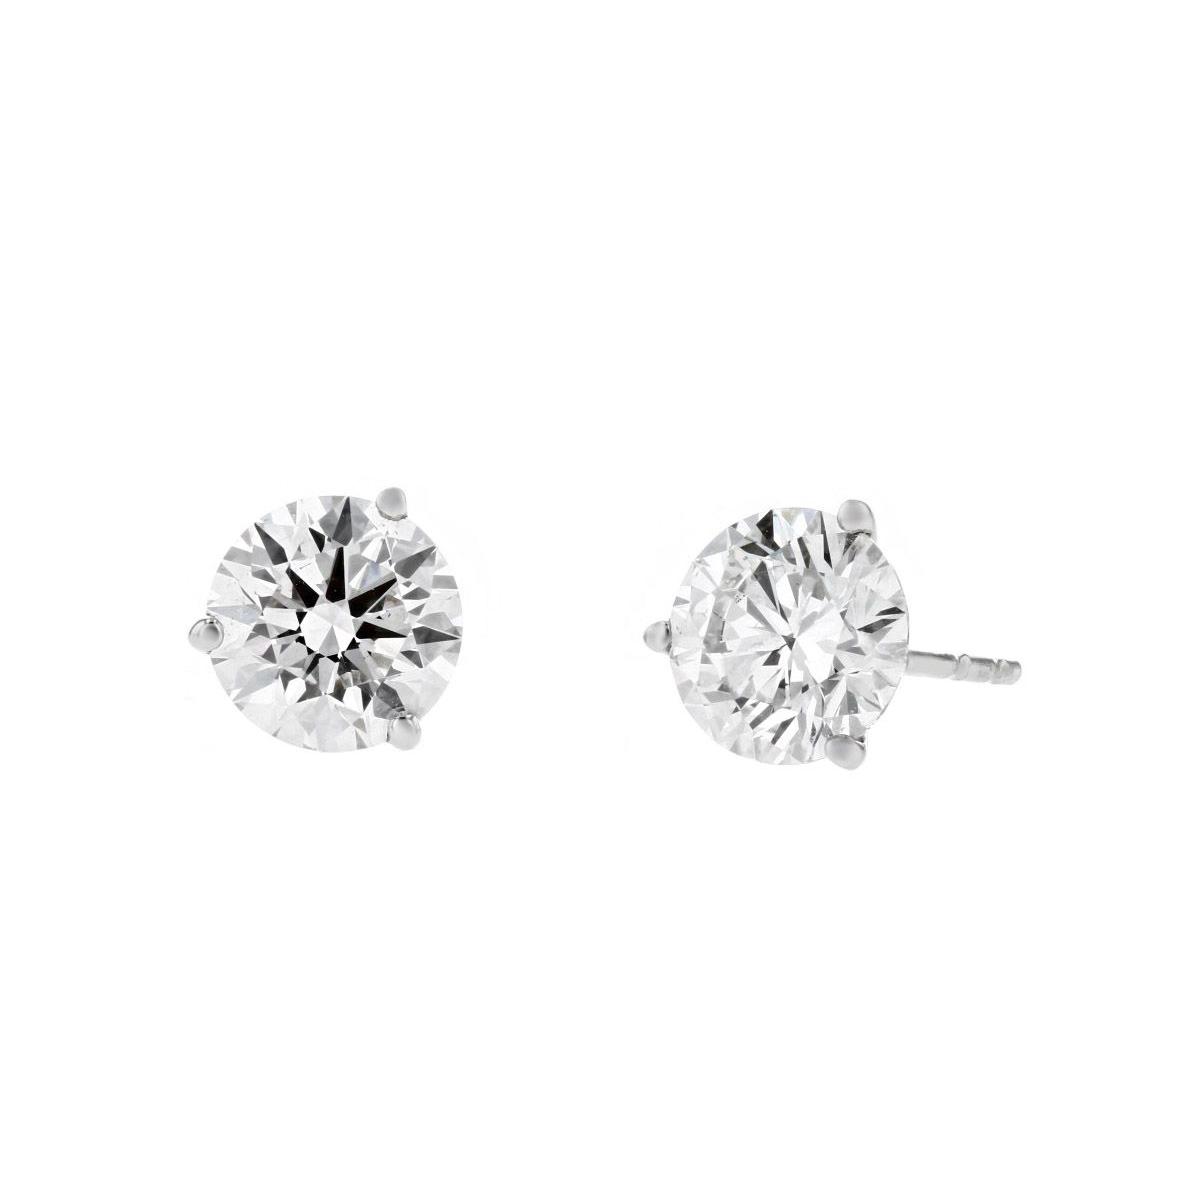 14k White Gold Lab Grown Diamond Martini Round Stud Earrings 1 83cttw